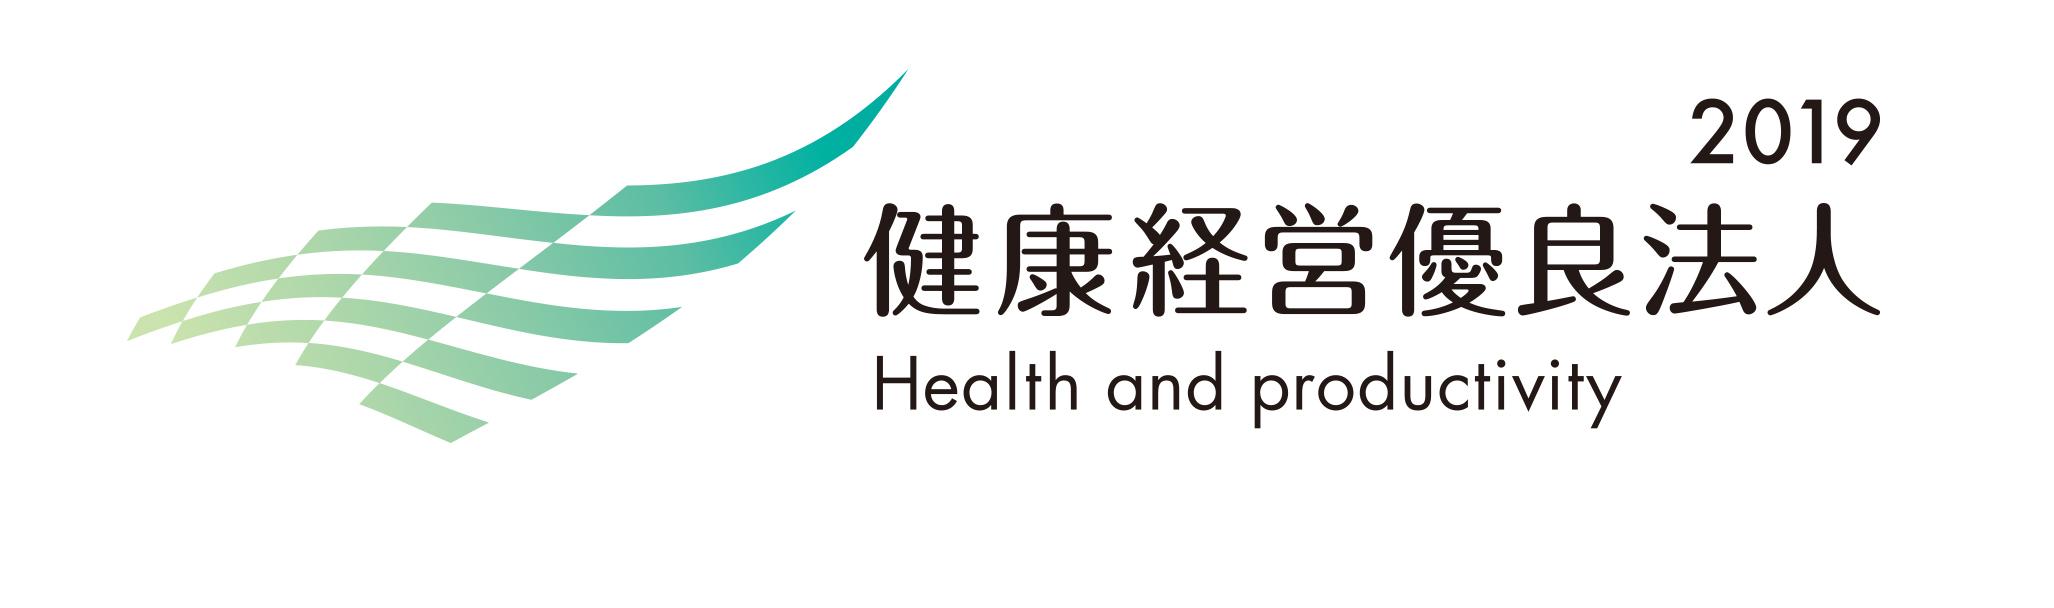 健康経営優良法人2018認証マーク